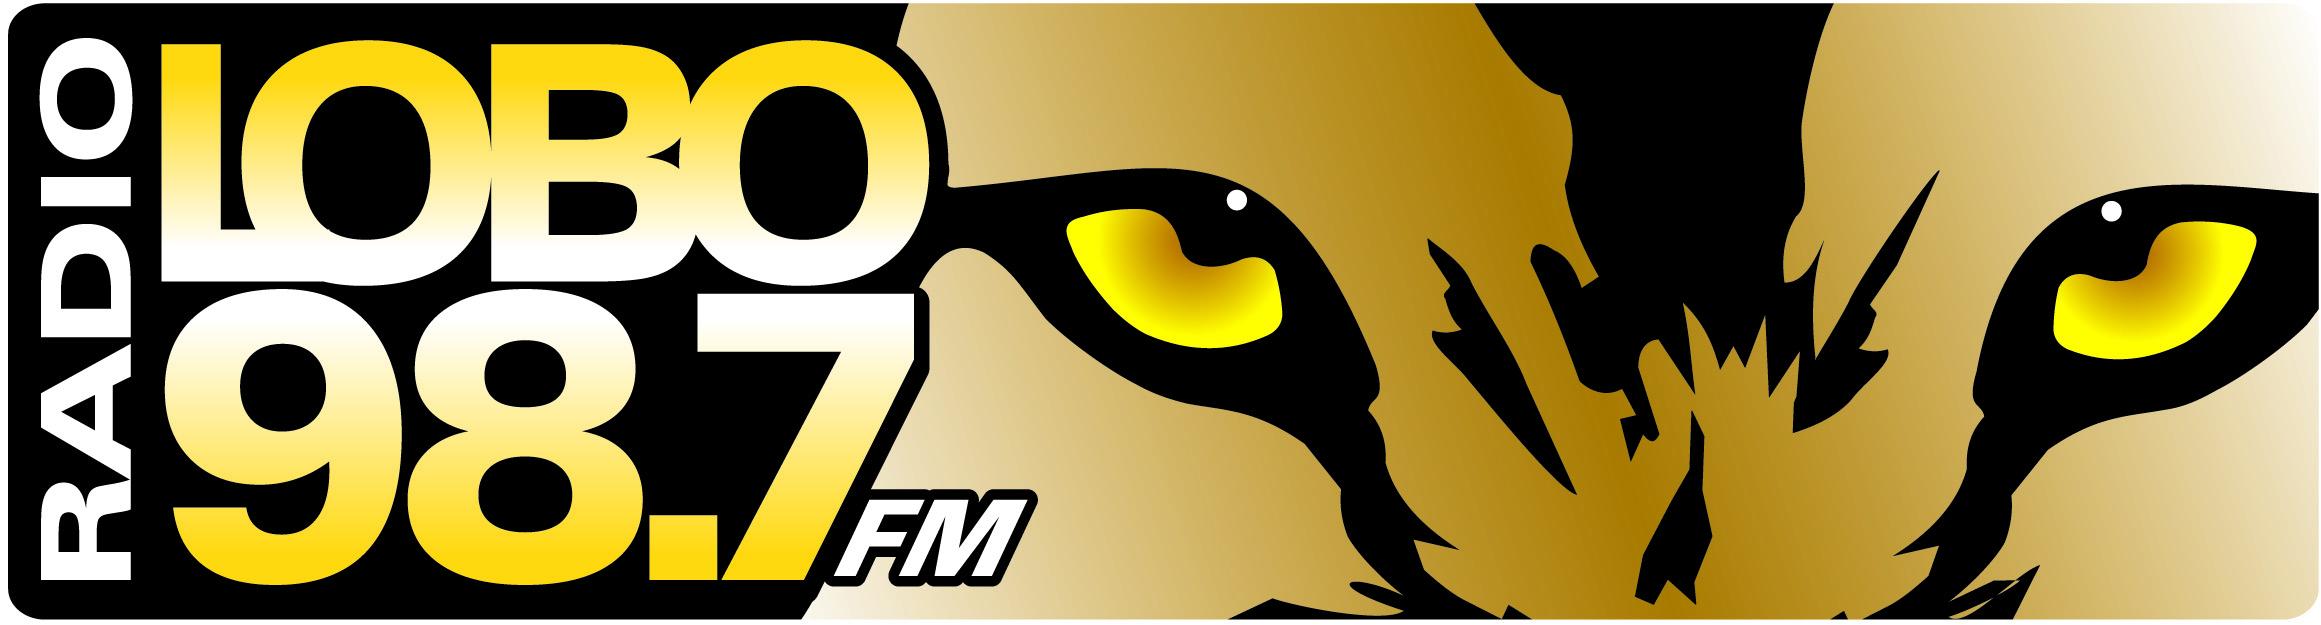 Radio Lobo 98.7